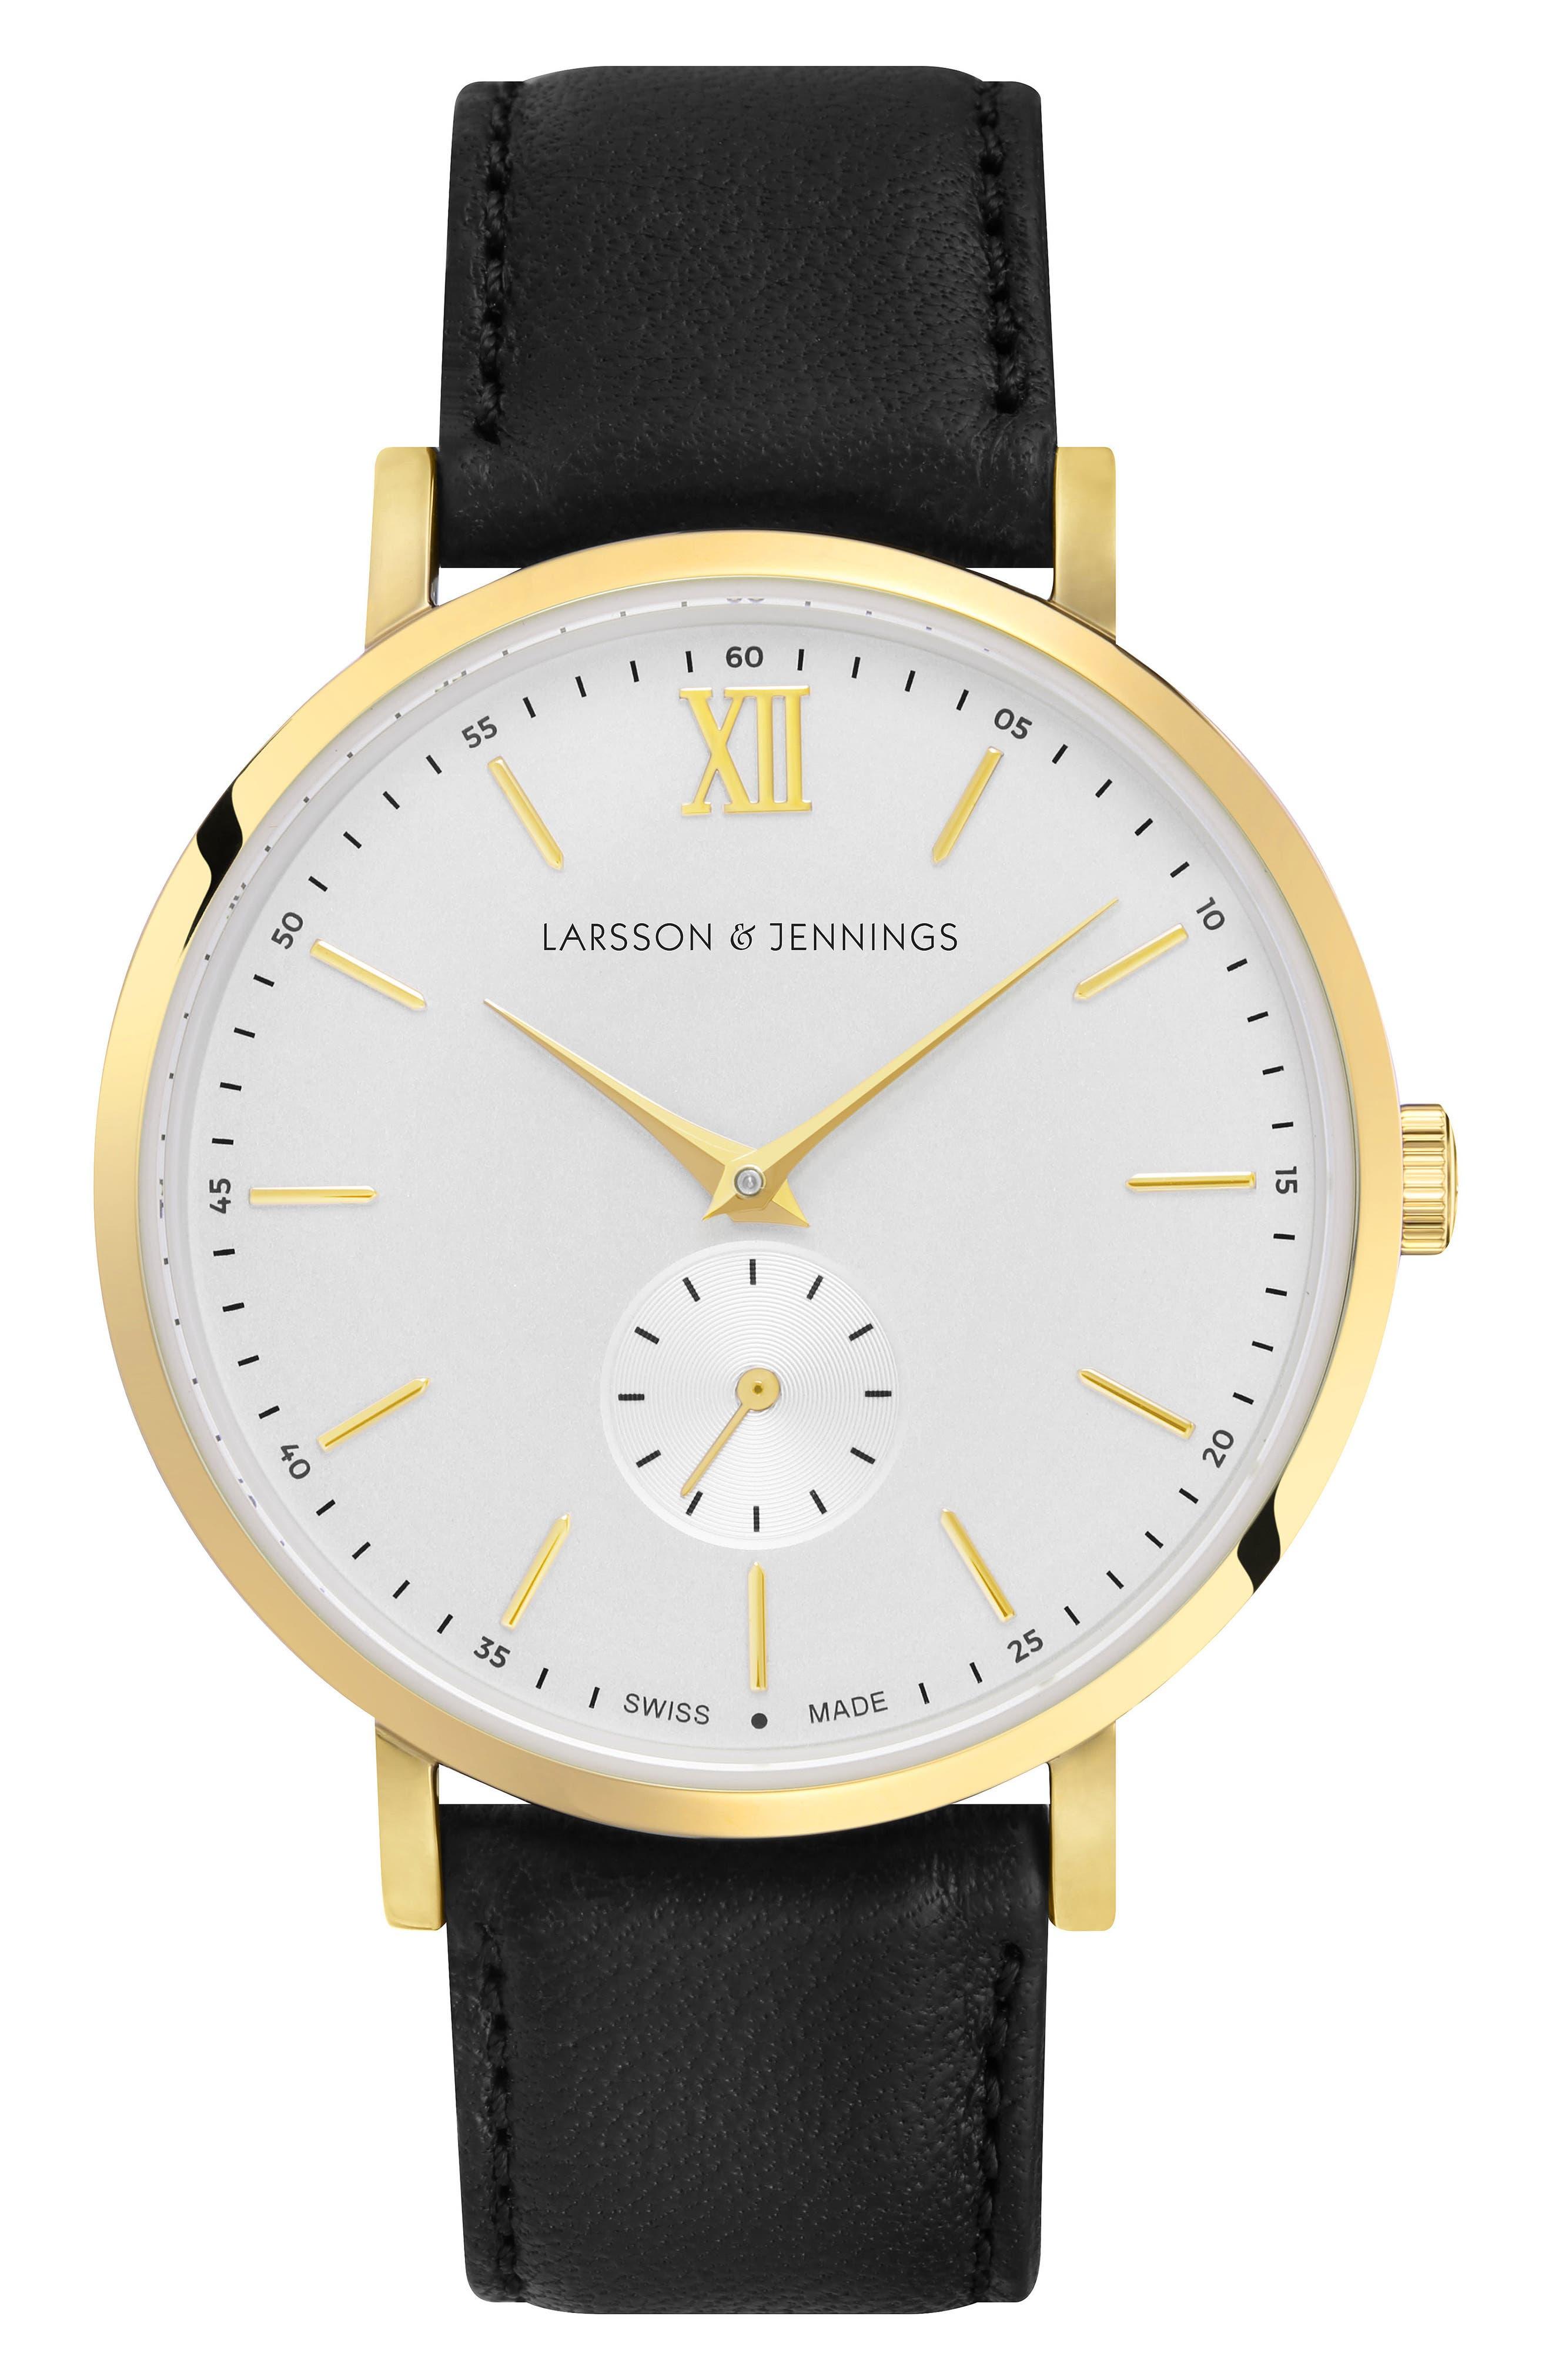 LARSSON & JENNINGS, Lugano Leather Strap Watch, 38mm, Main thumbnail 1, color, 001